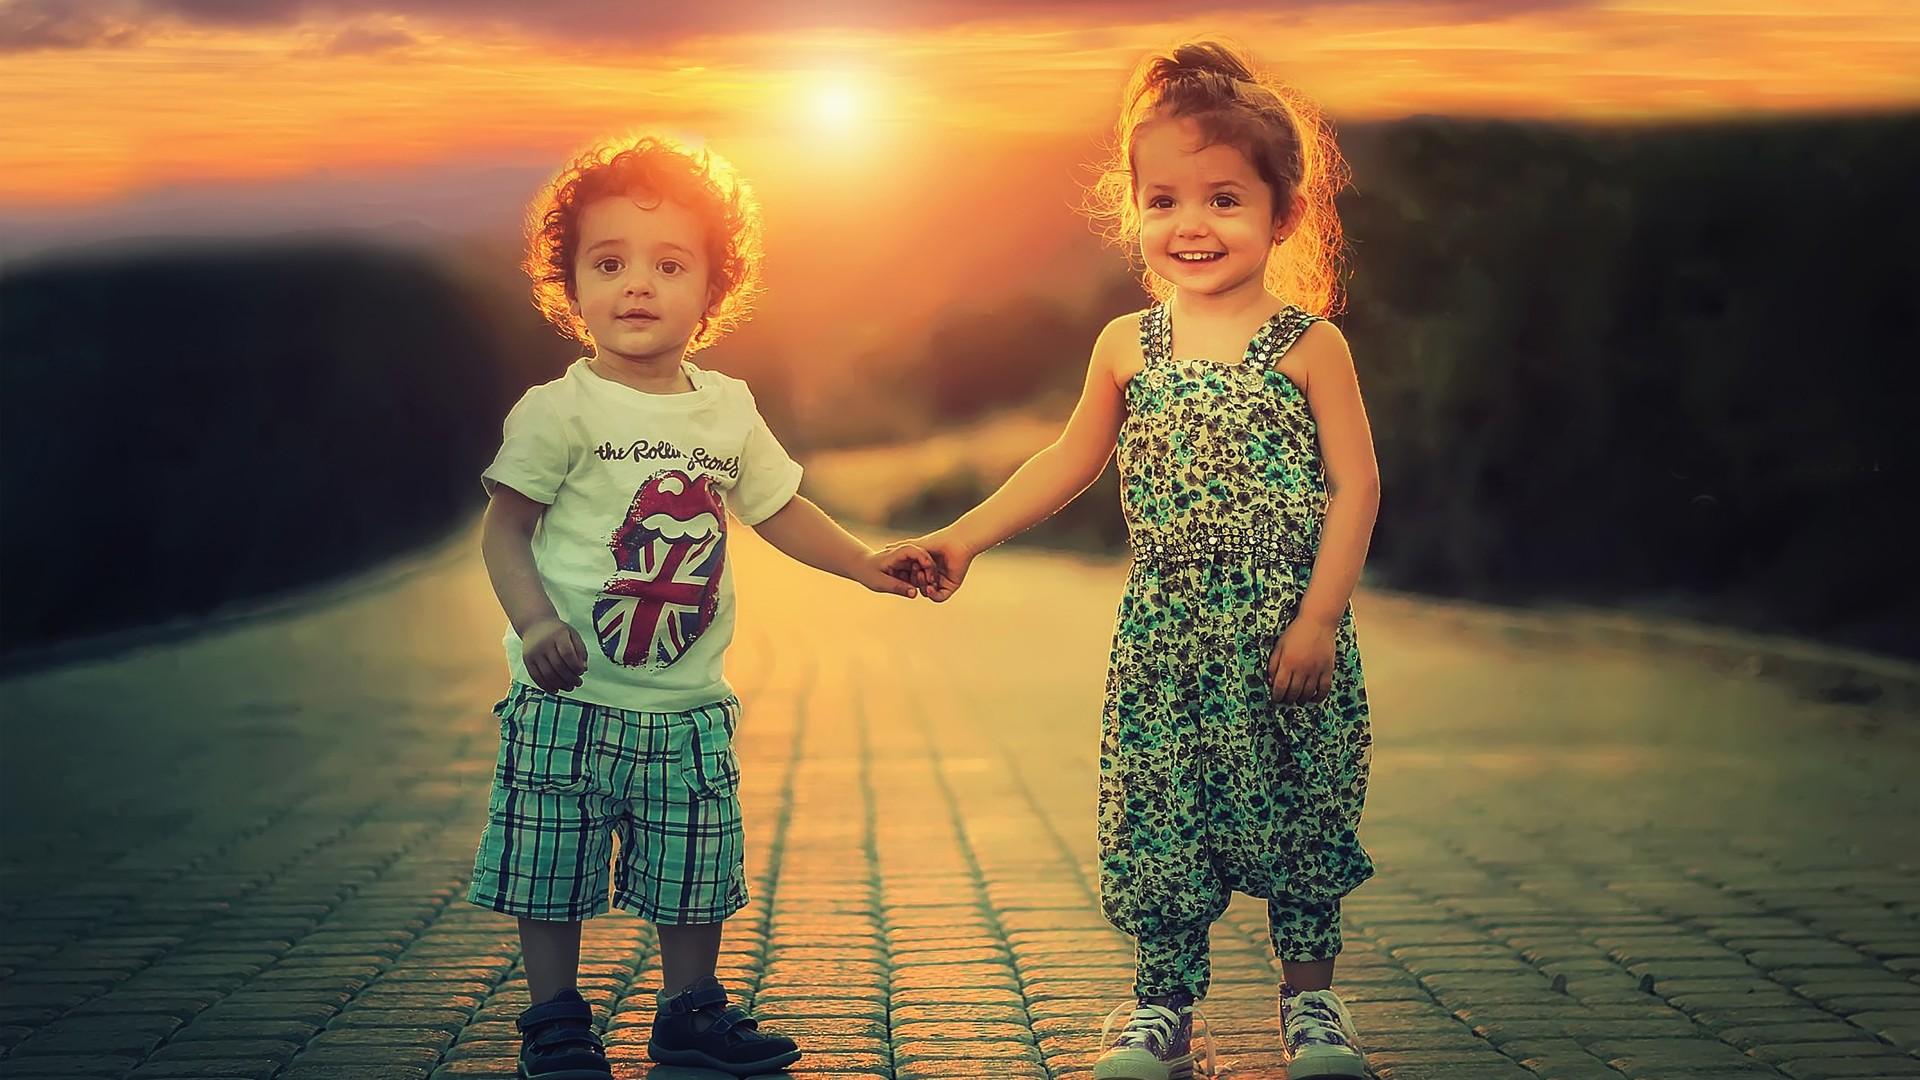 Hd Love Cute Baby Couple 413121 Hd Wallpaper Backgrounds